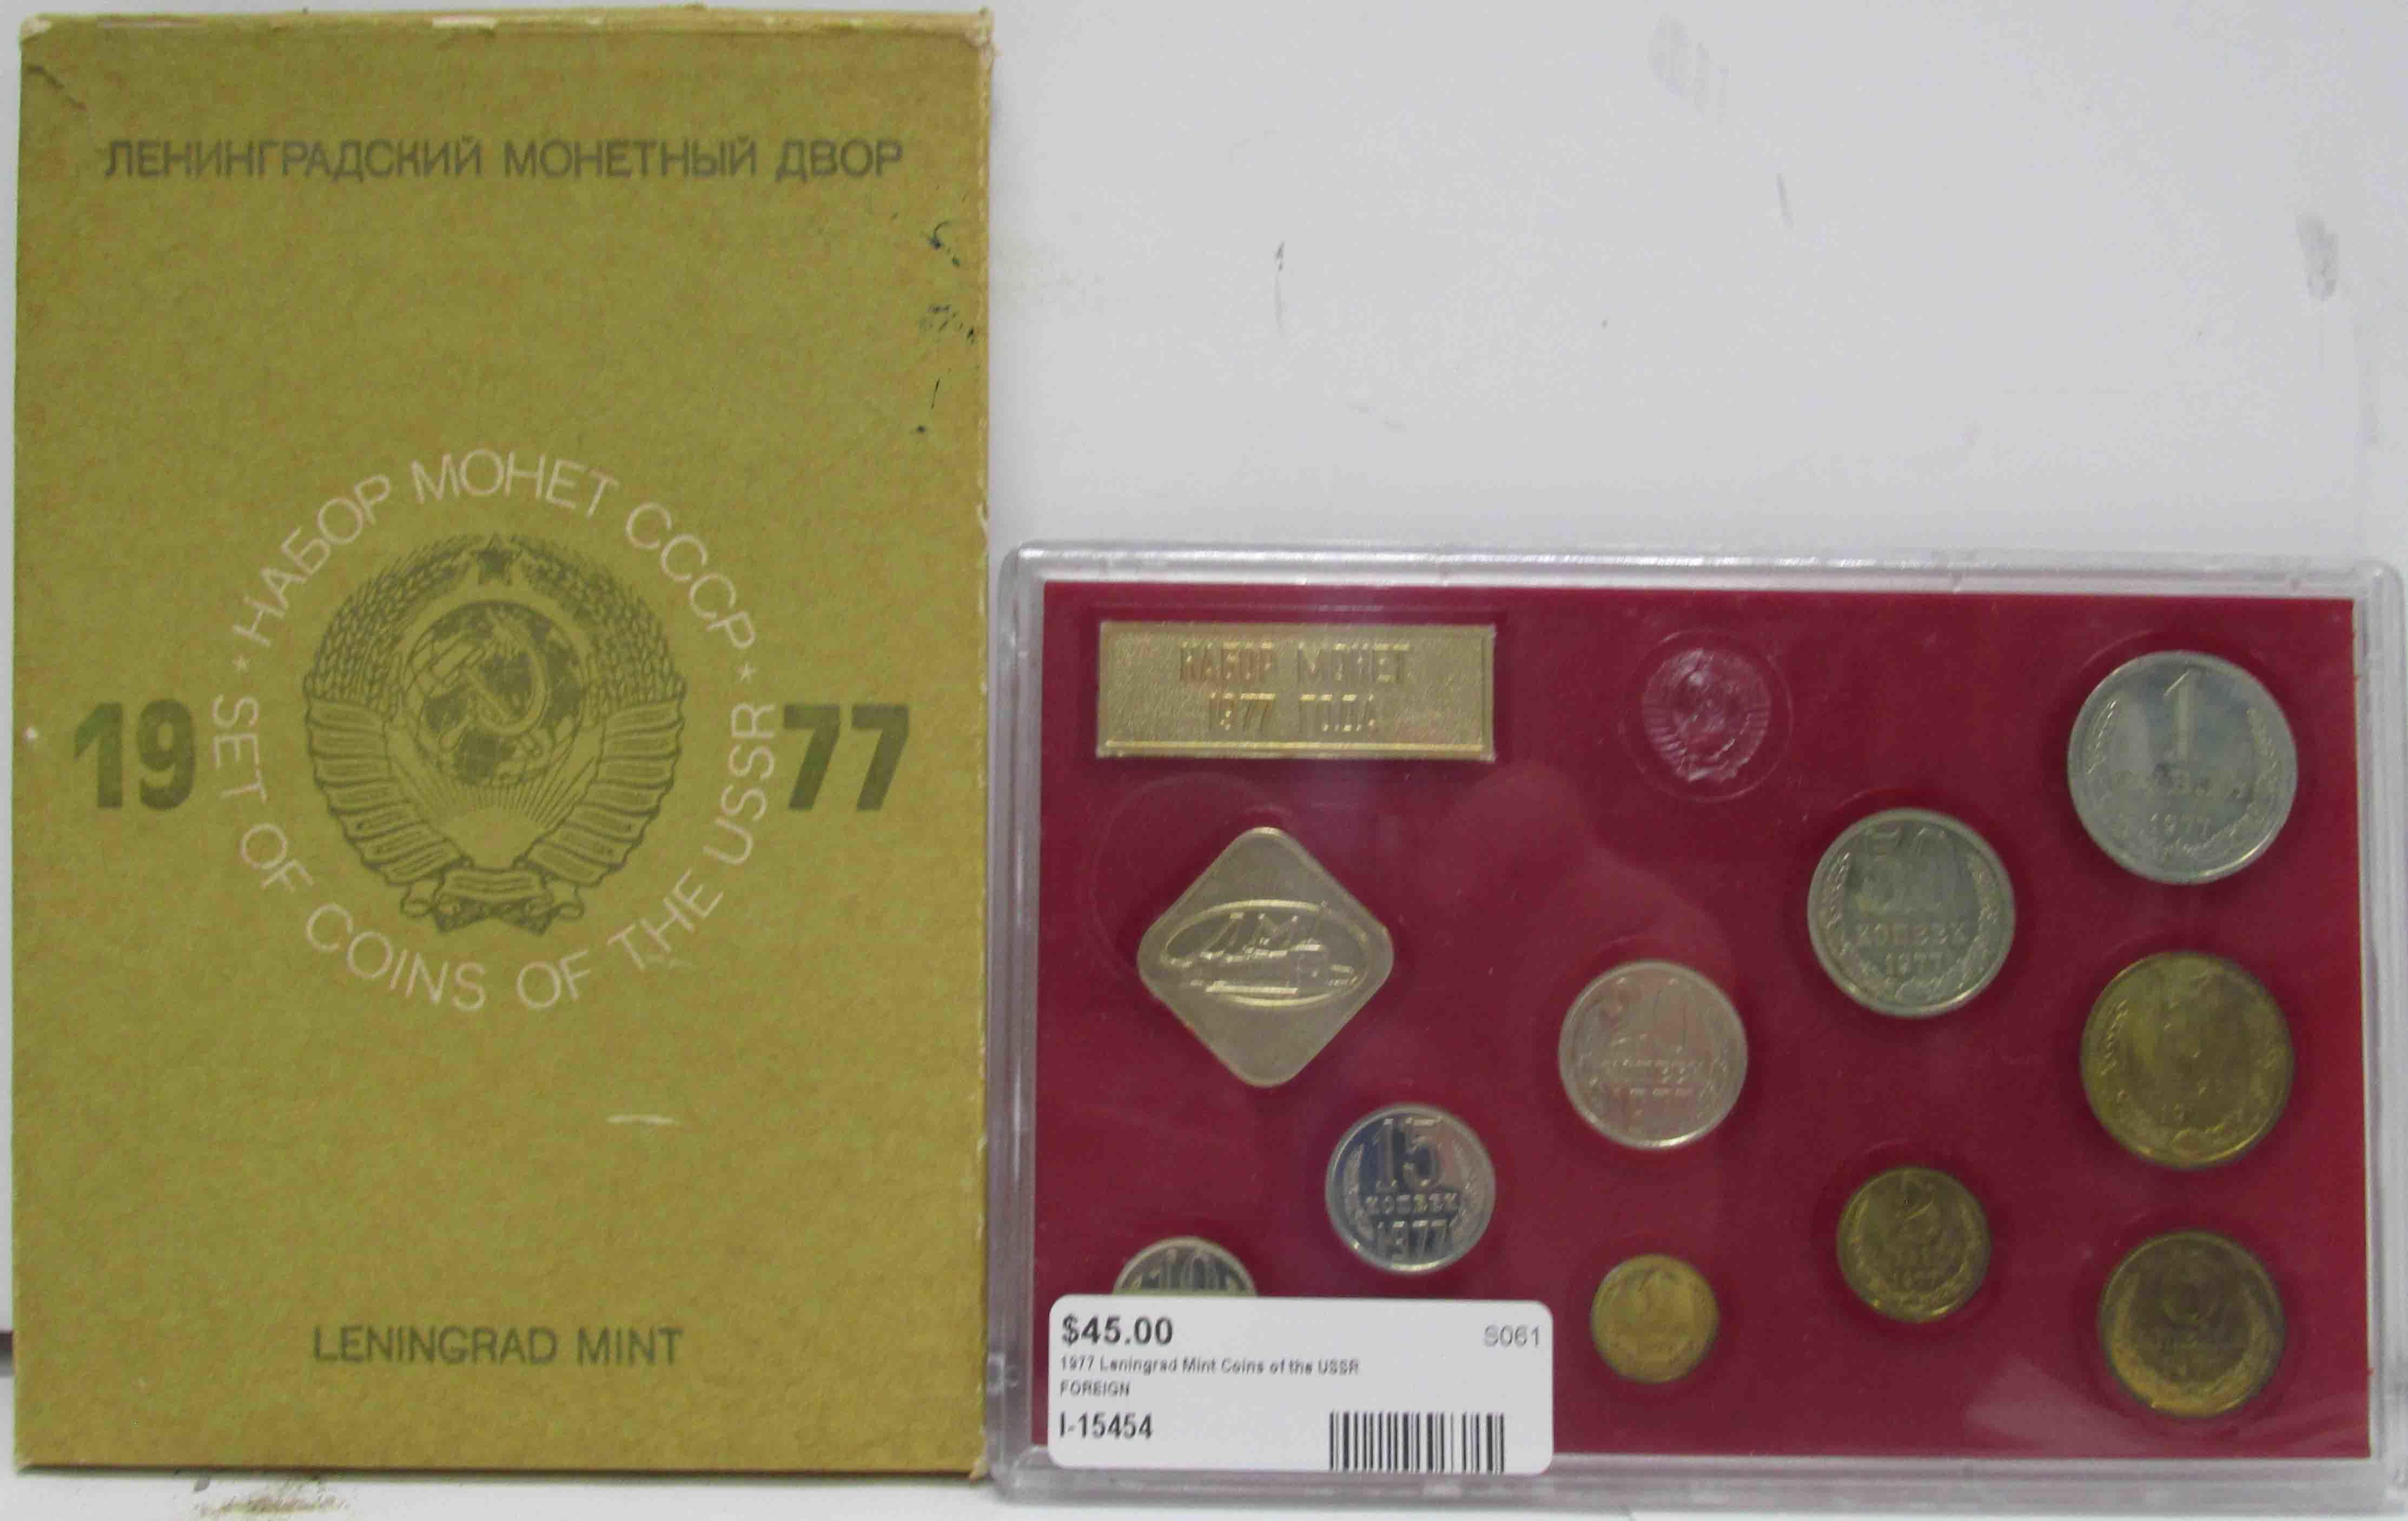 1977 Leningrad Mint Coins of the USSR Set